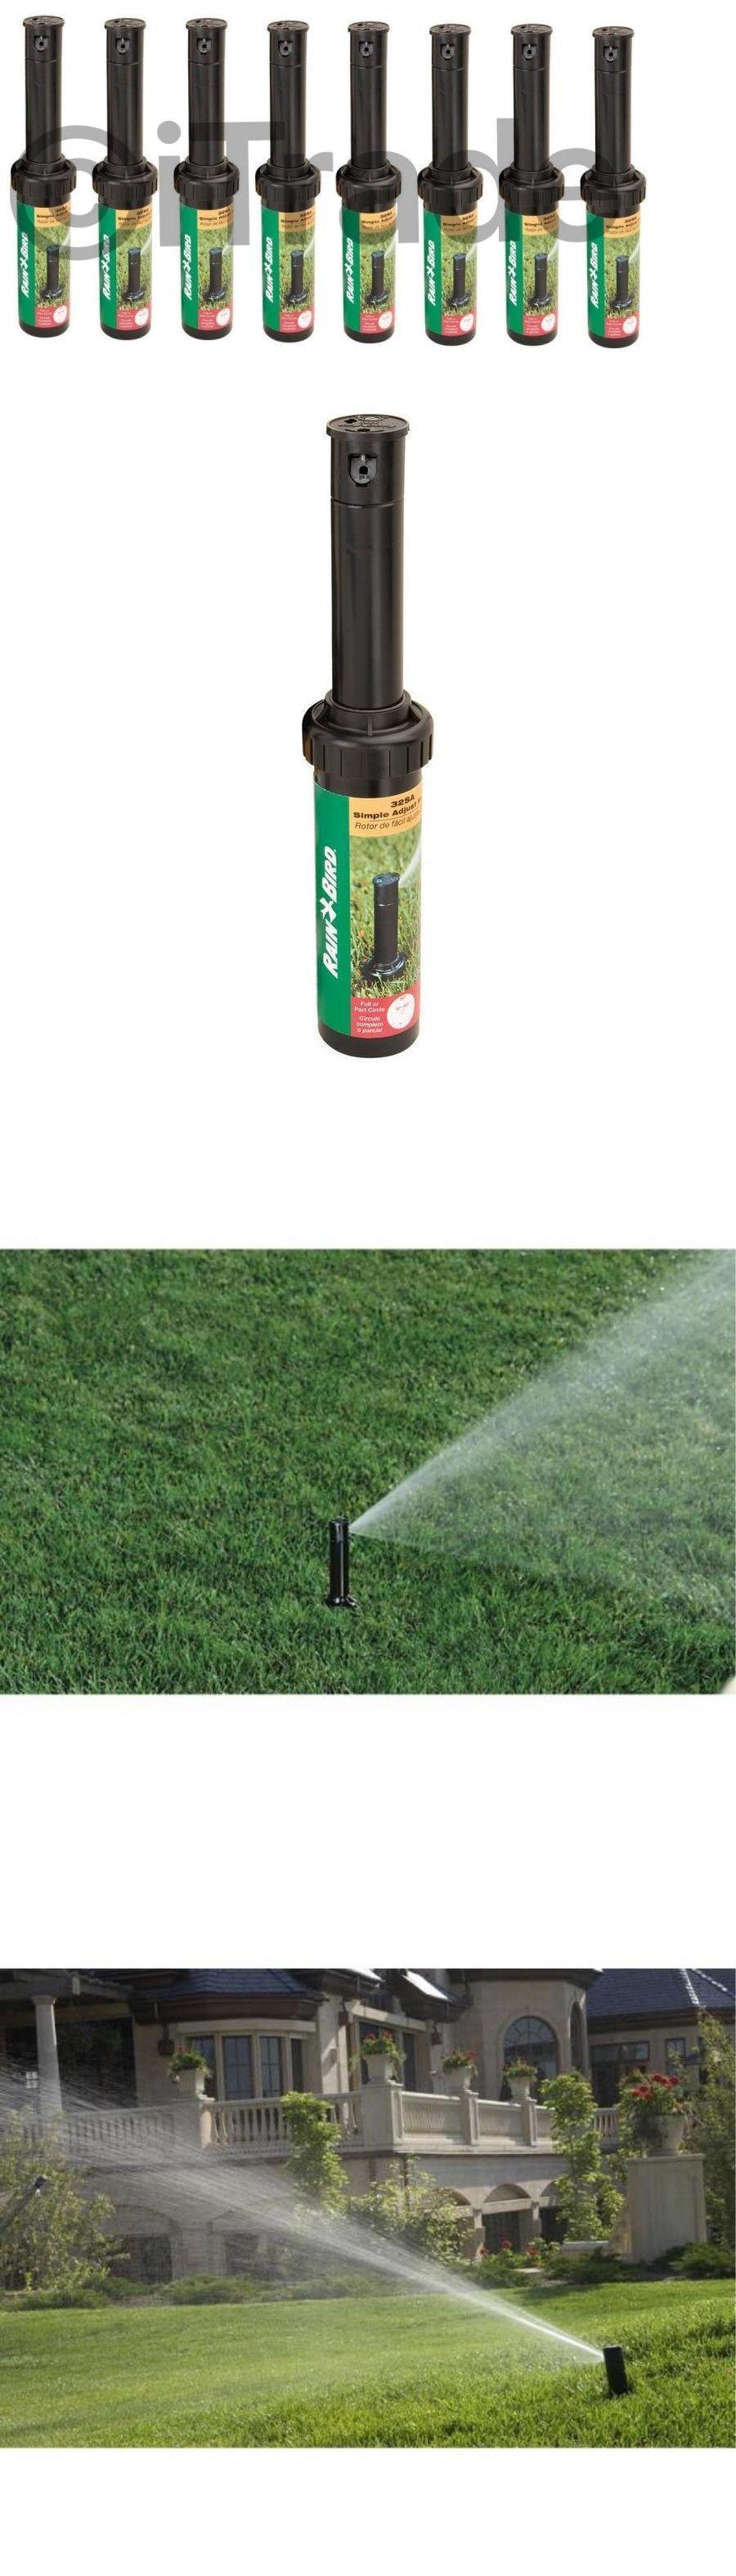 Lawn Sprinklers 20542 *Lot Of 8* Rain Bird 32Sa 4